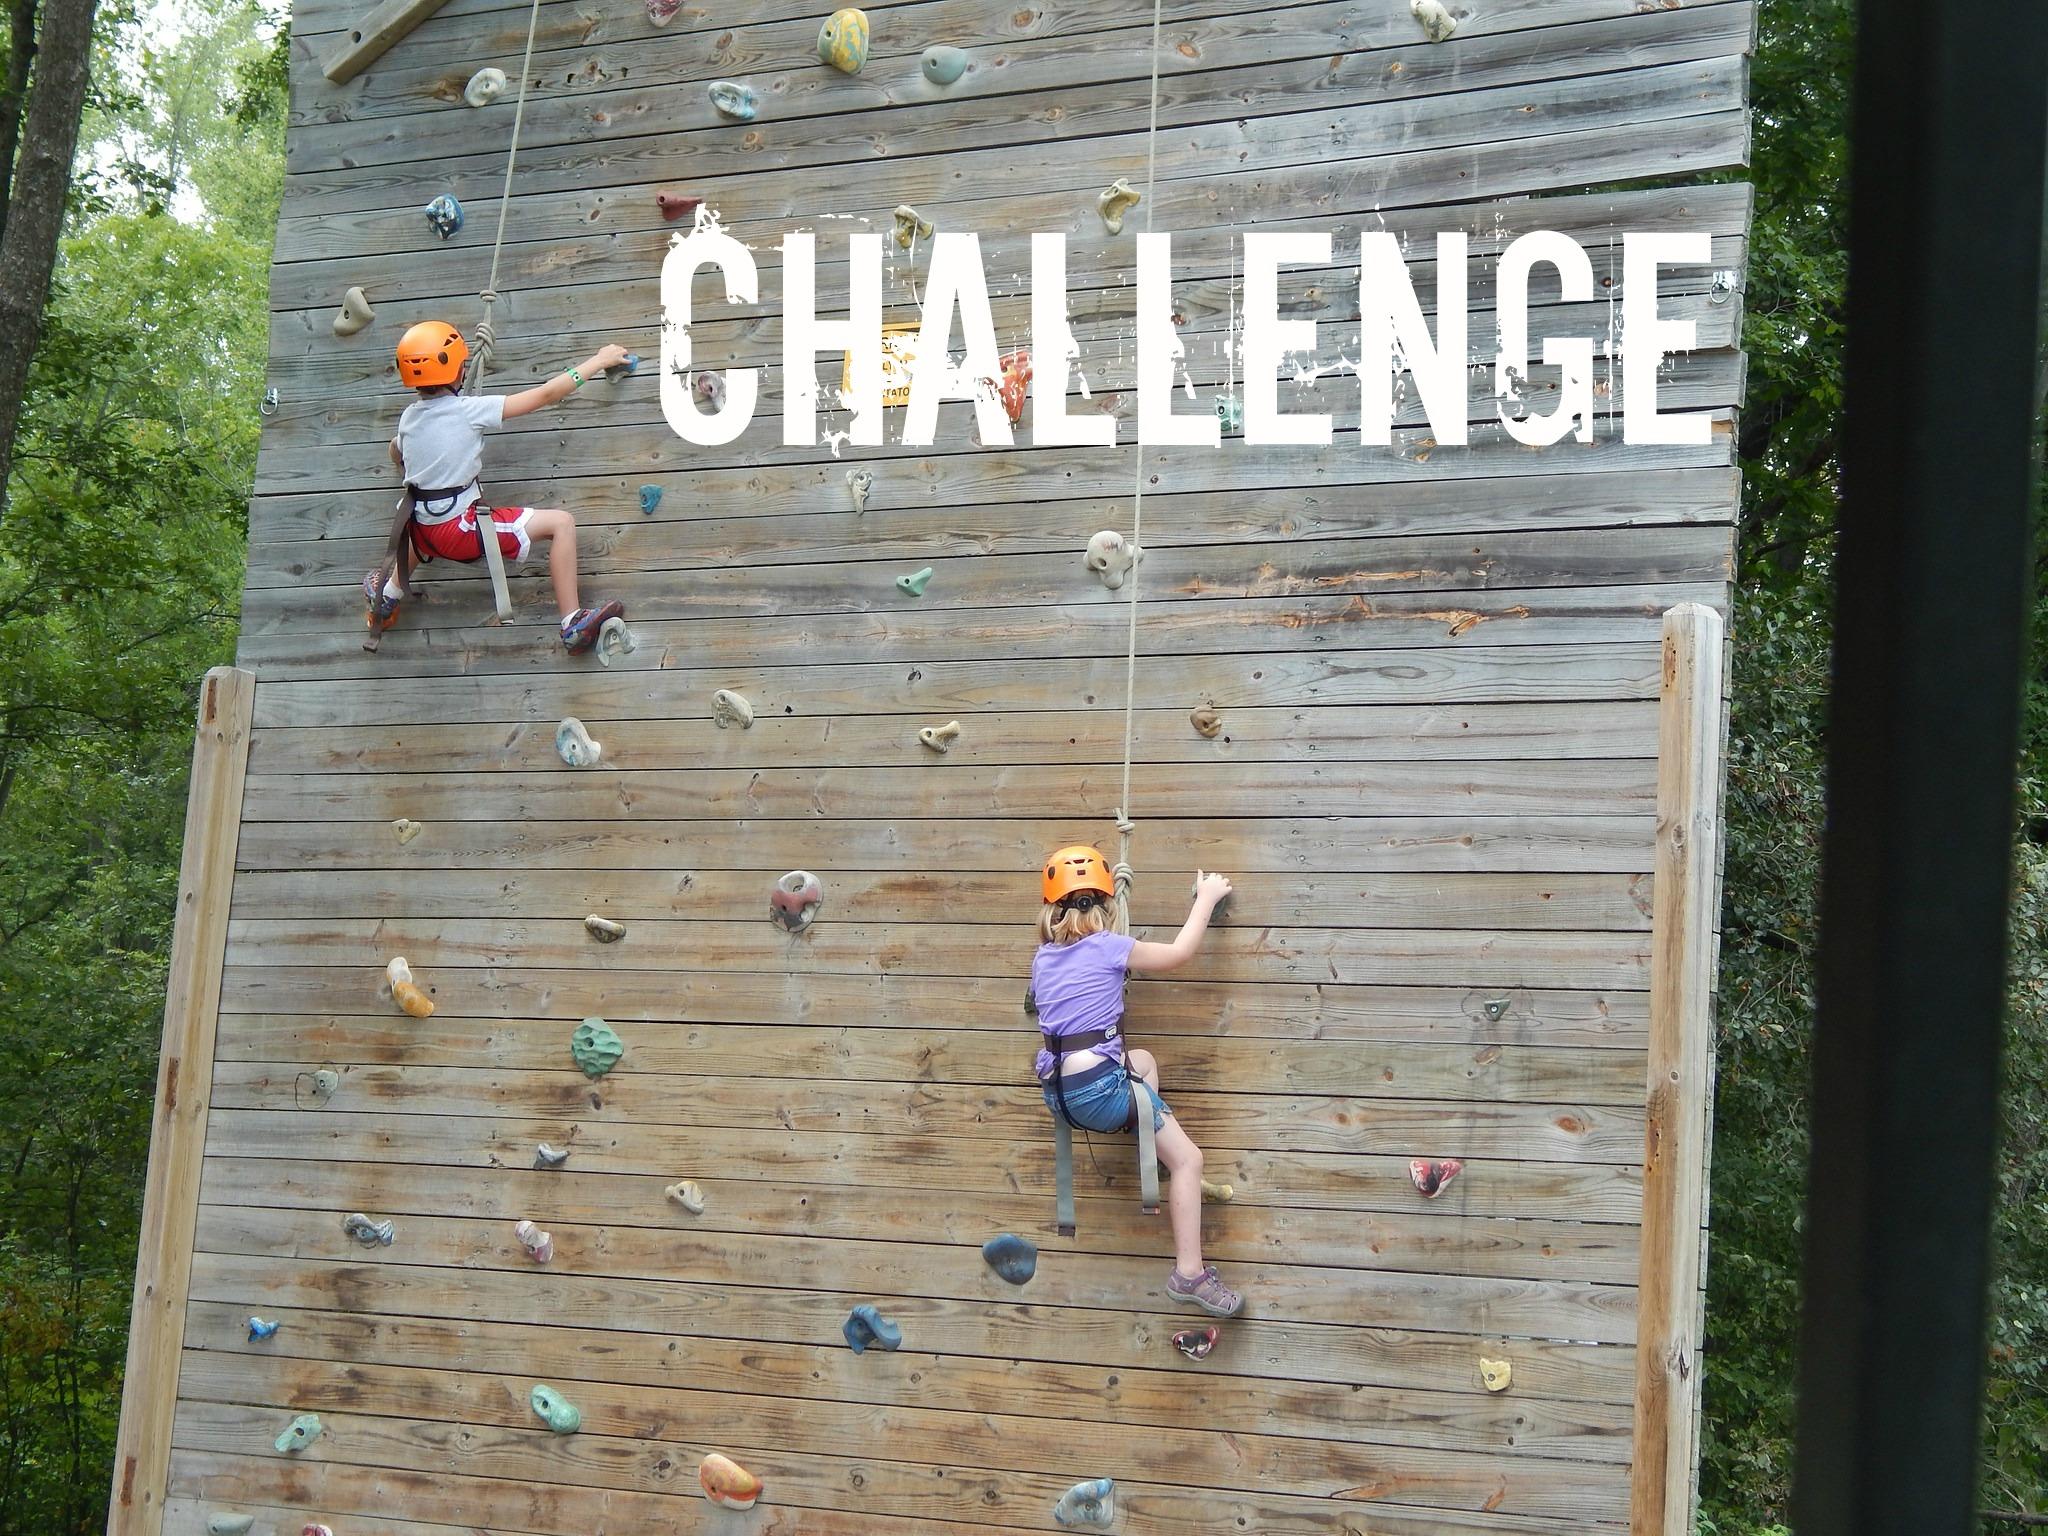 wordpics-challenge